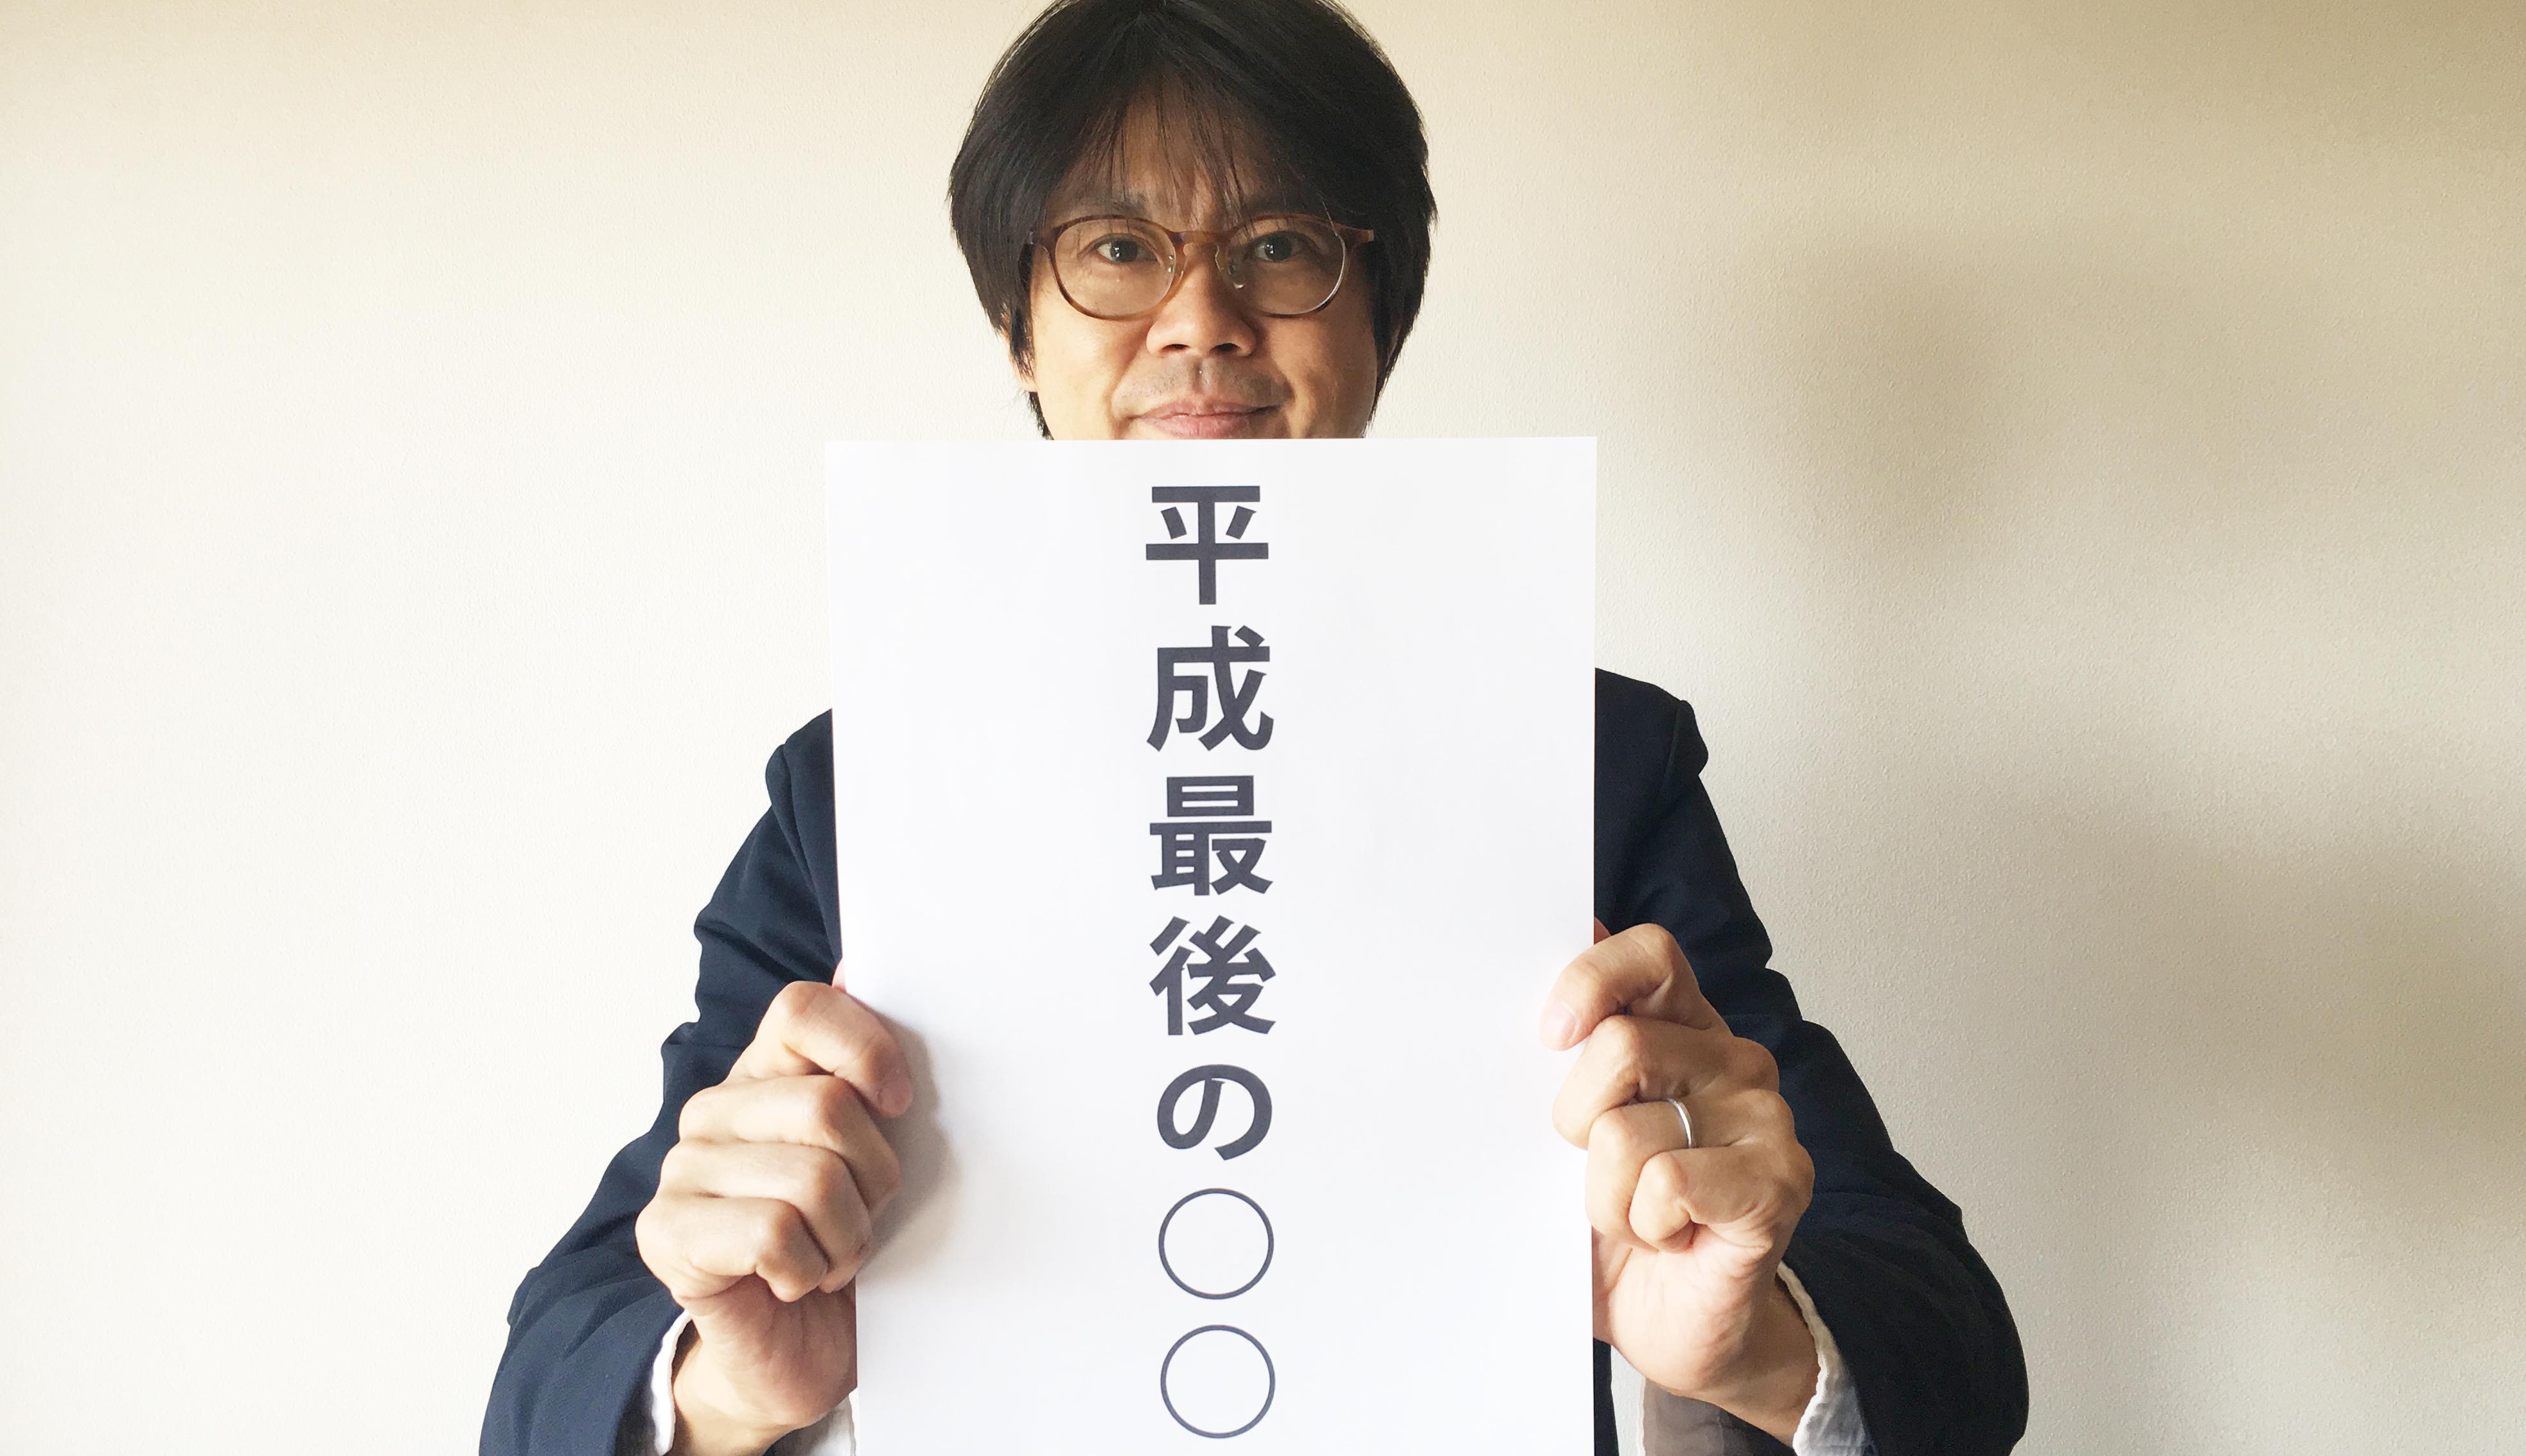 「平成最後のOO展」出展者募集